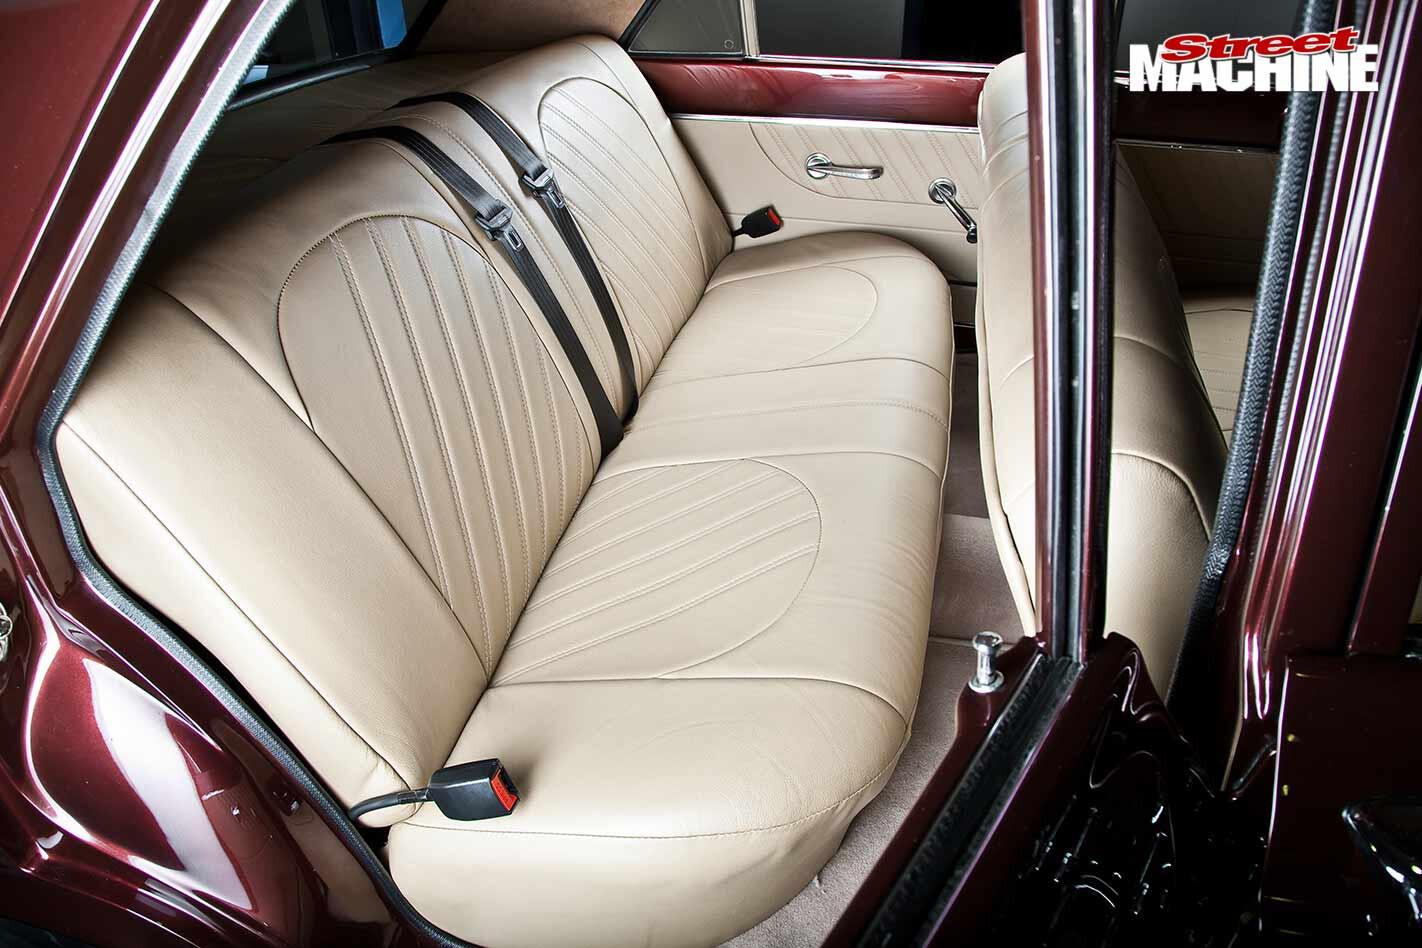 Ford Compact Fairlane interior rear